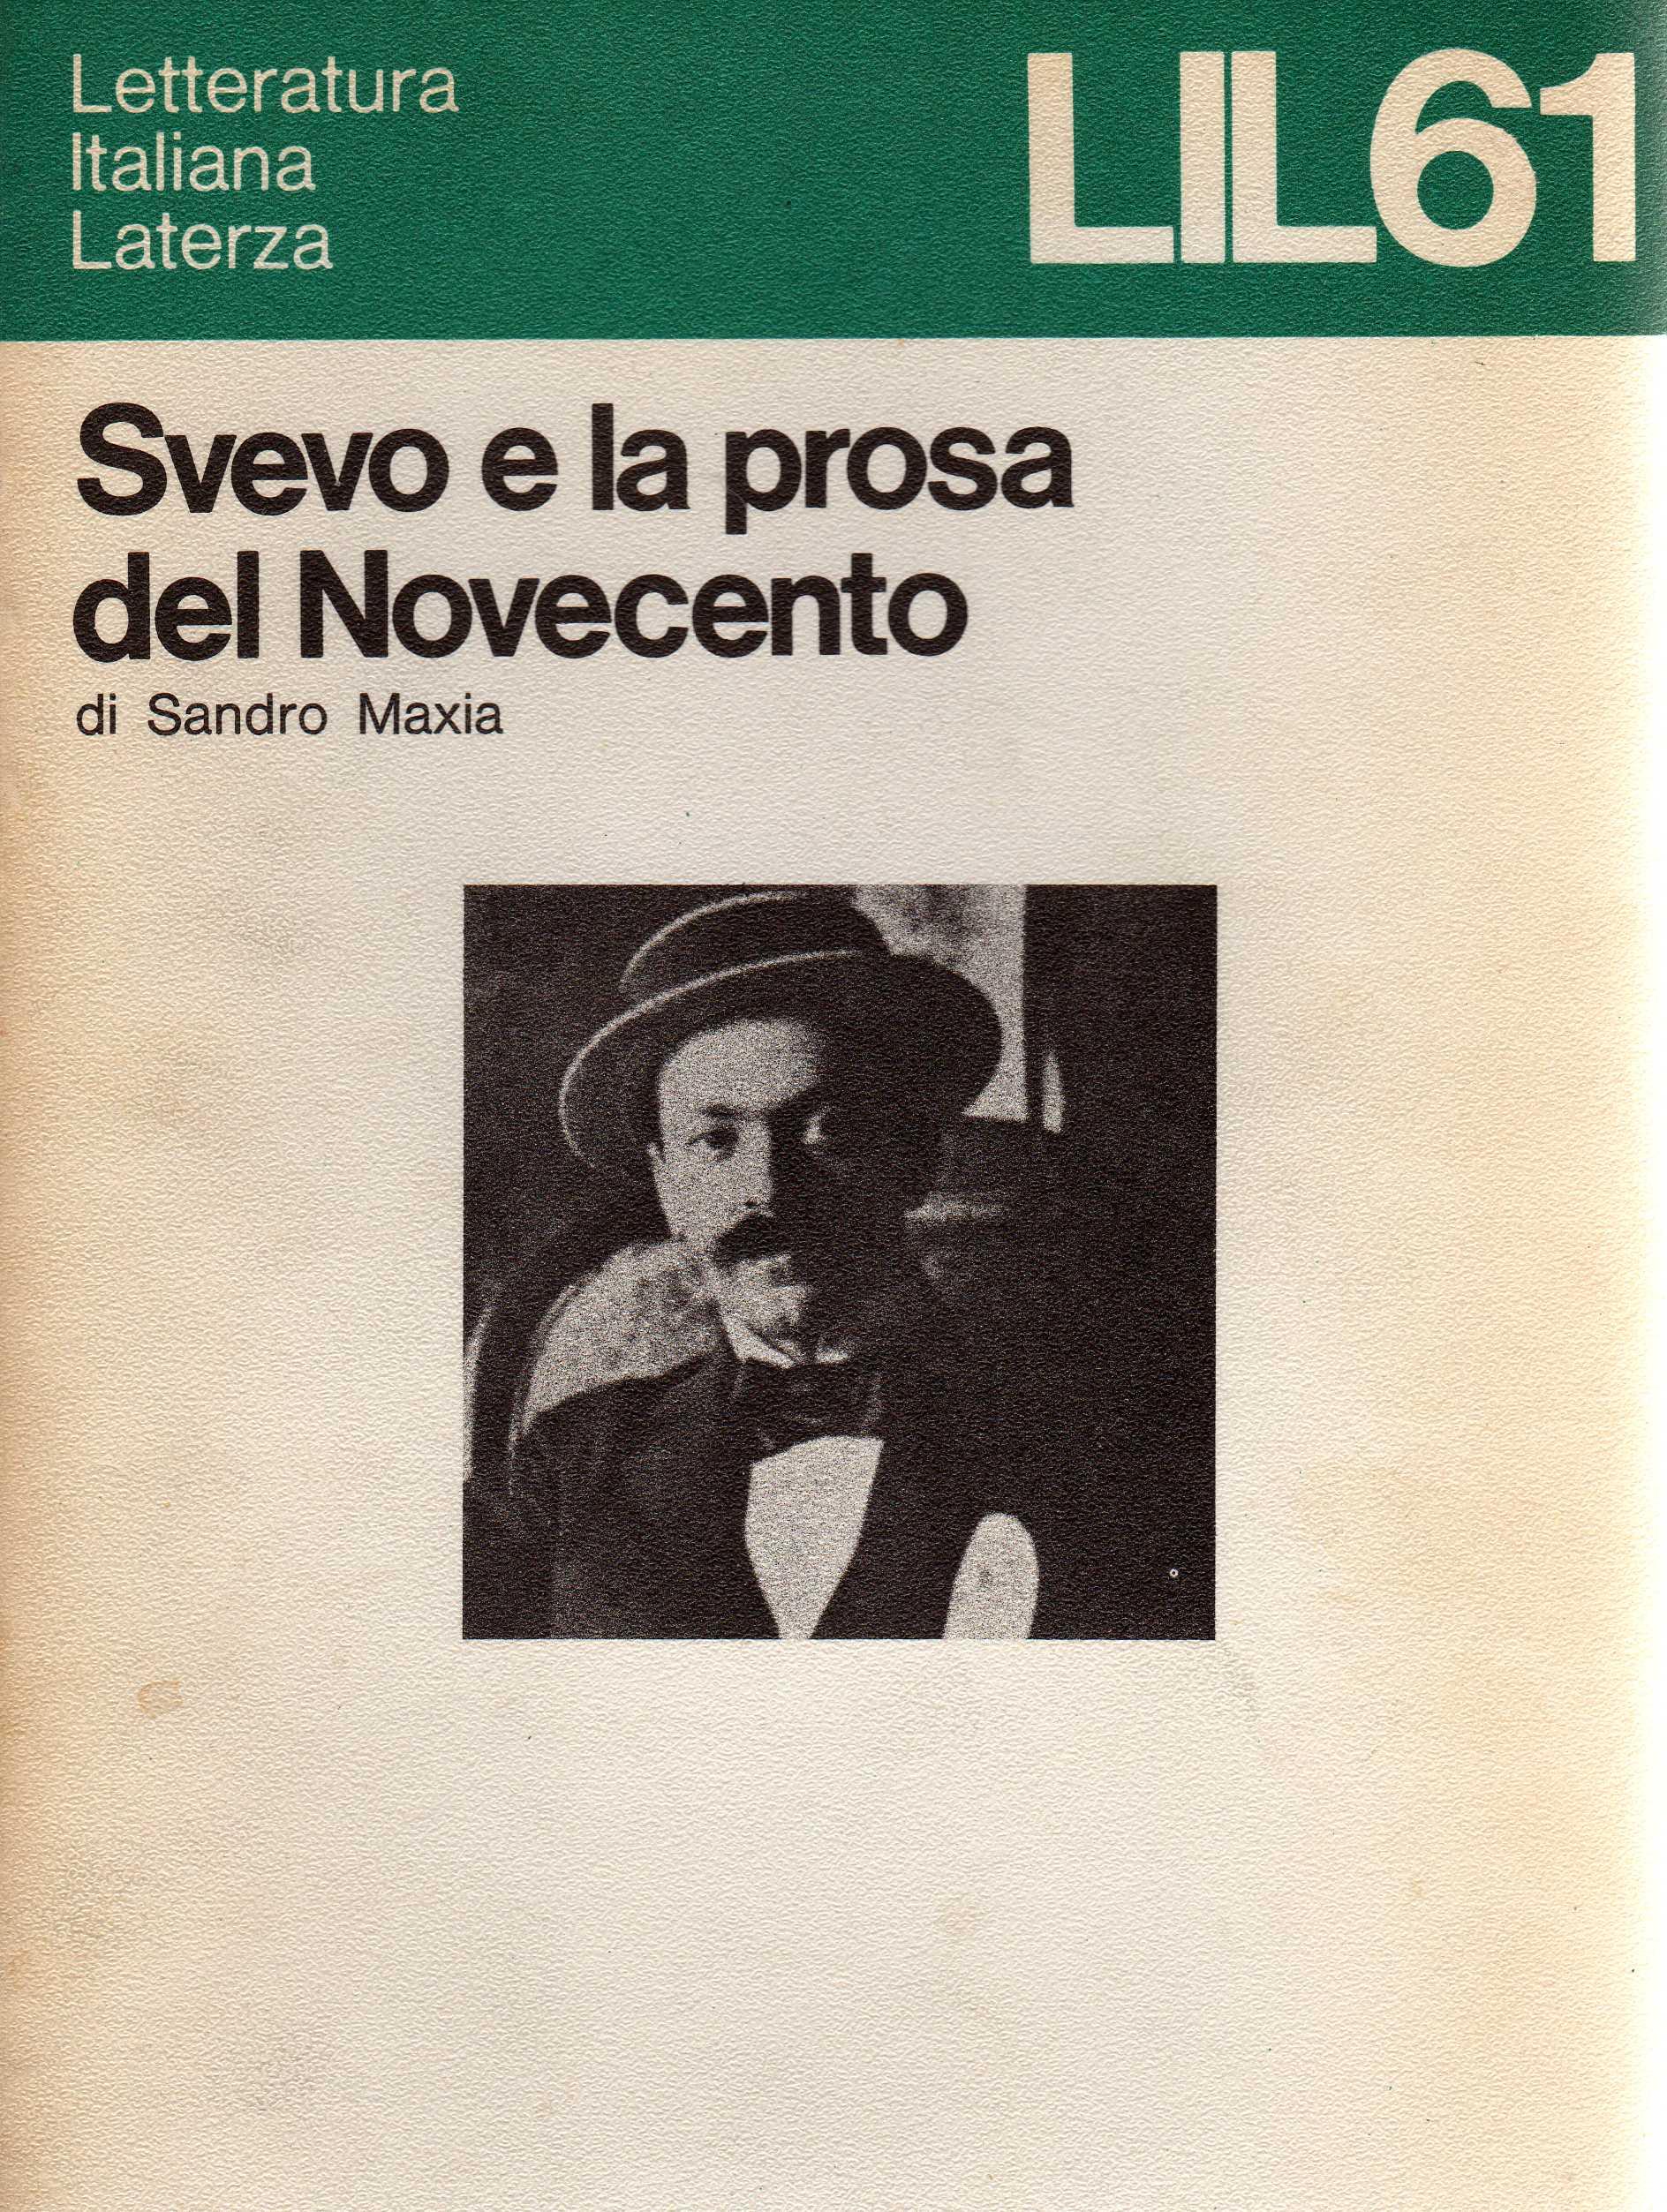 Svevo e la prosa del Novecento